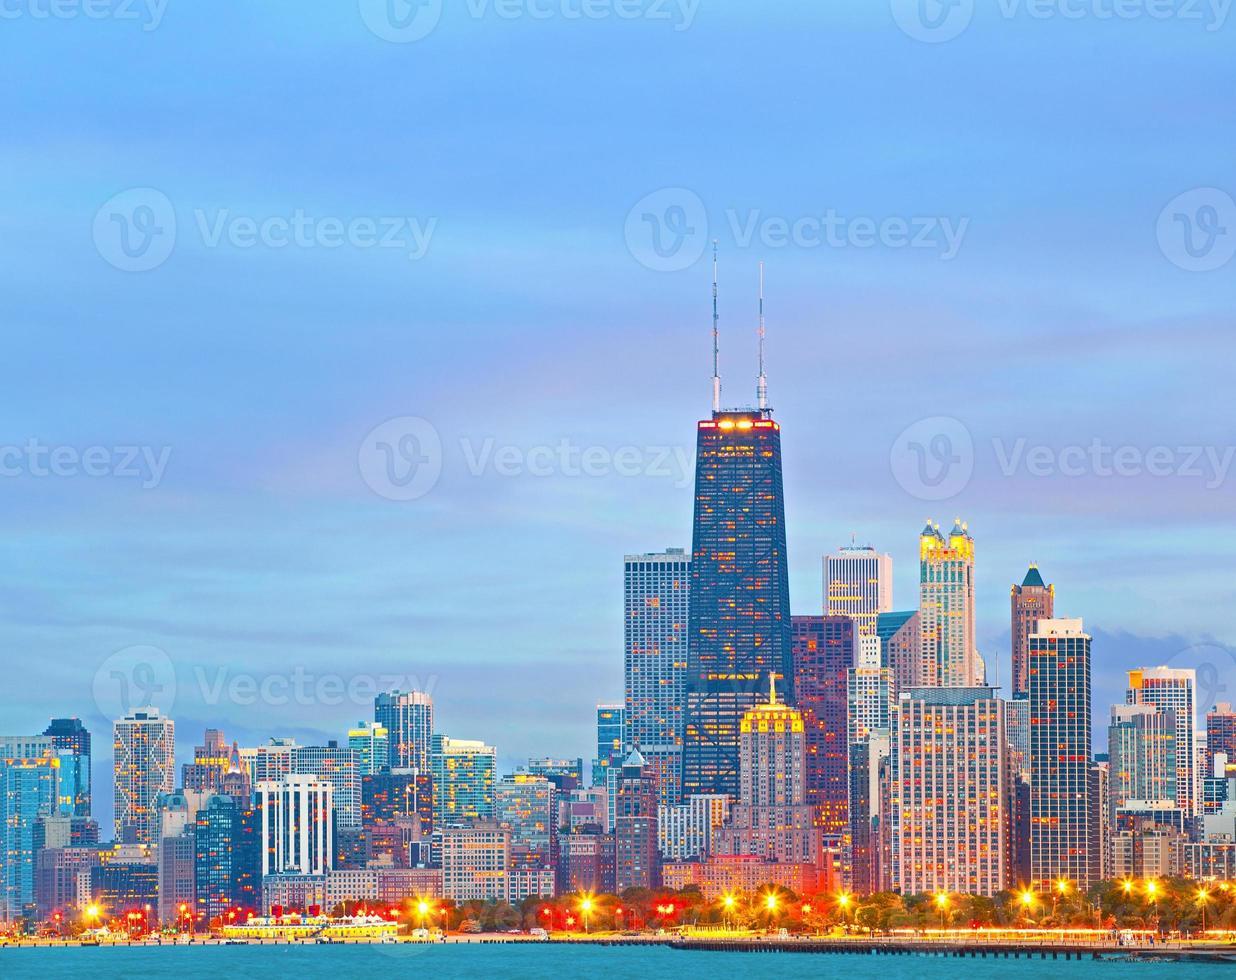 Chicago, Illinois photo